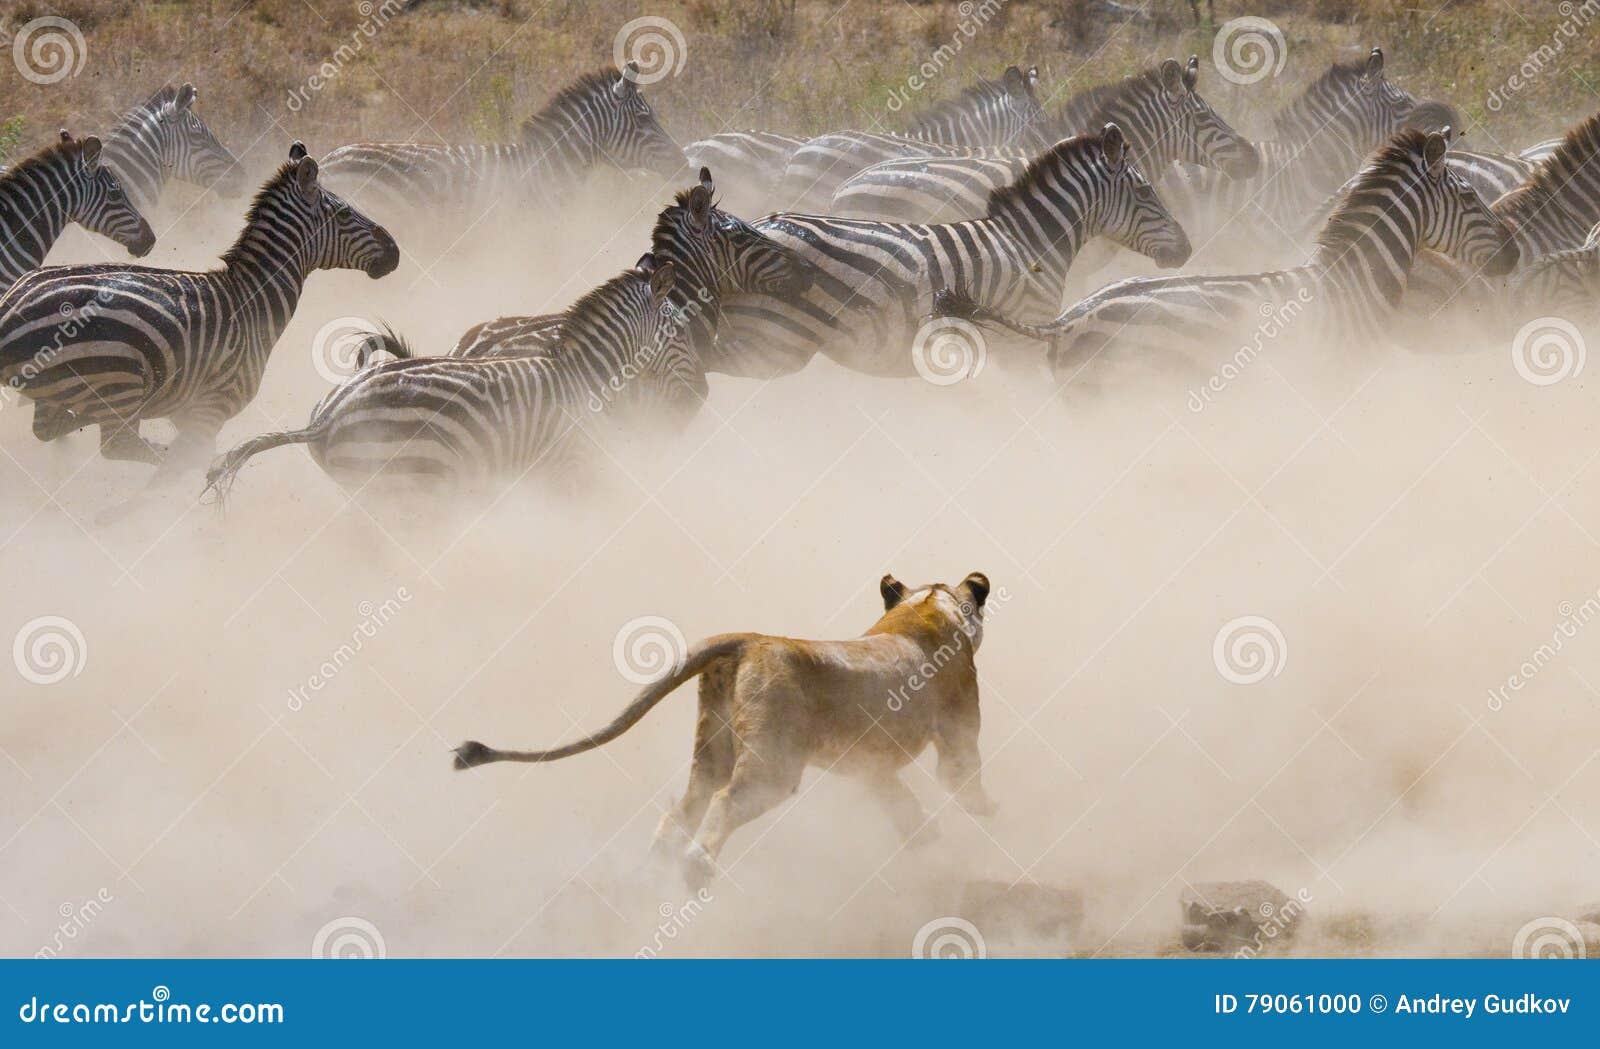 Löwinangriff auf einem Zebra Chiang Mai kenia tanzania Masai Mara serengeti